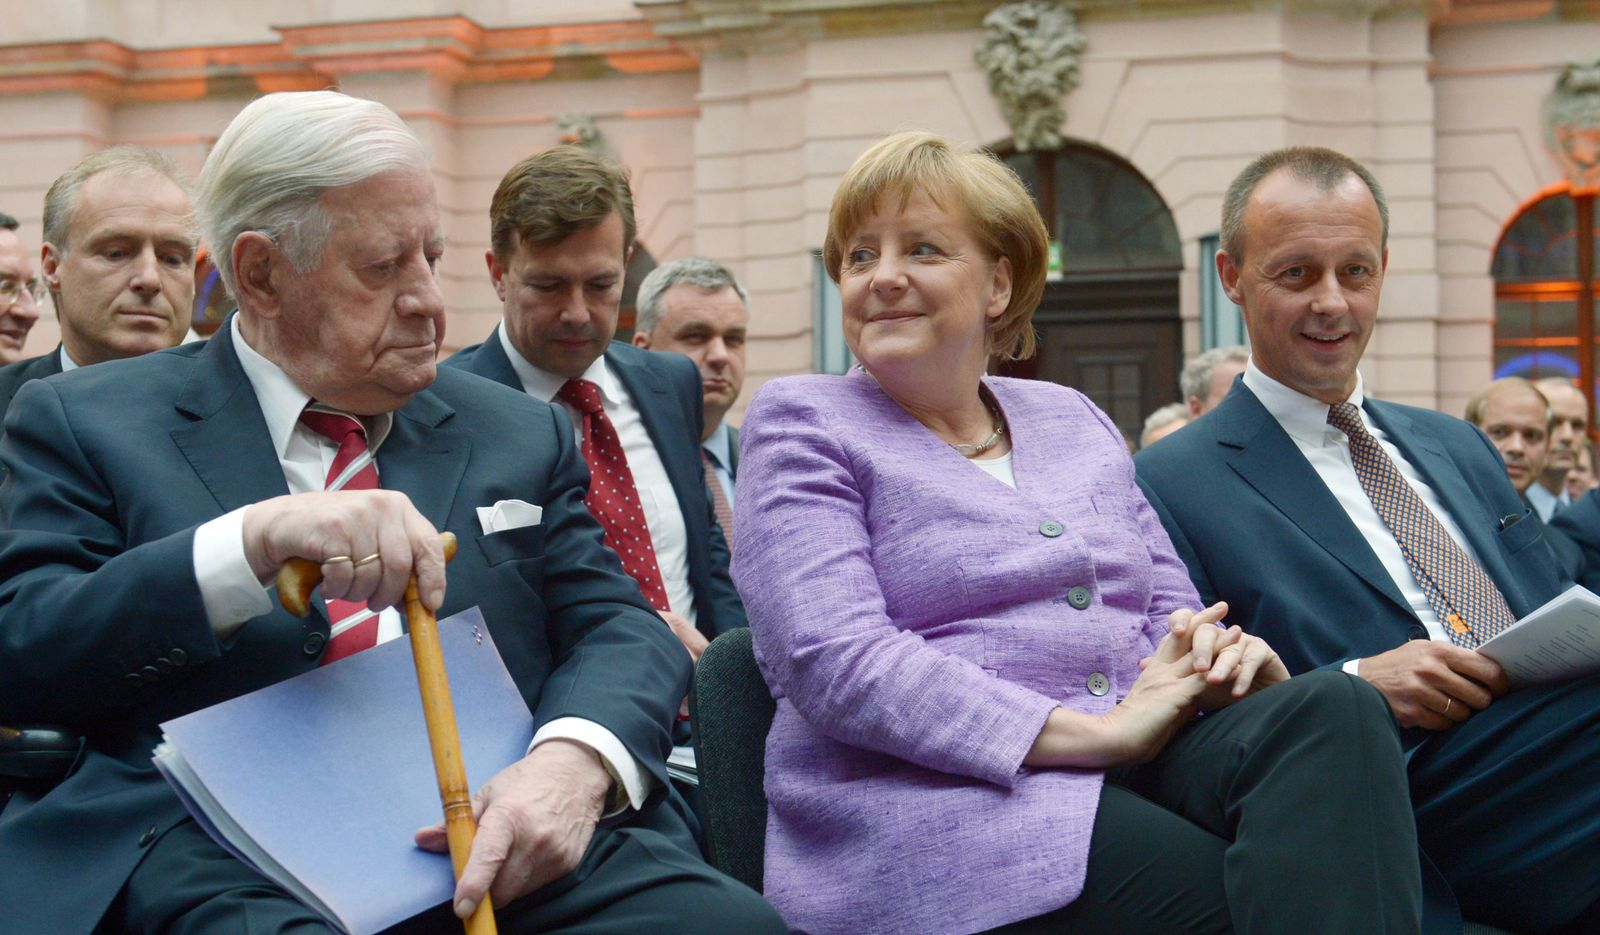 Helmut Schmidt Angela Merkel Friedrich Merz